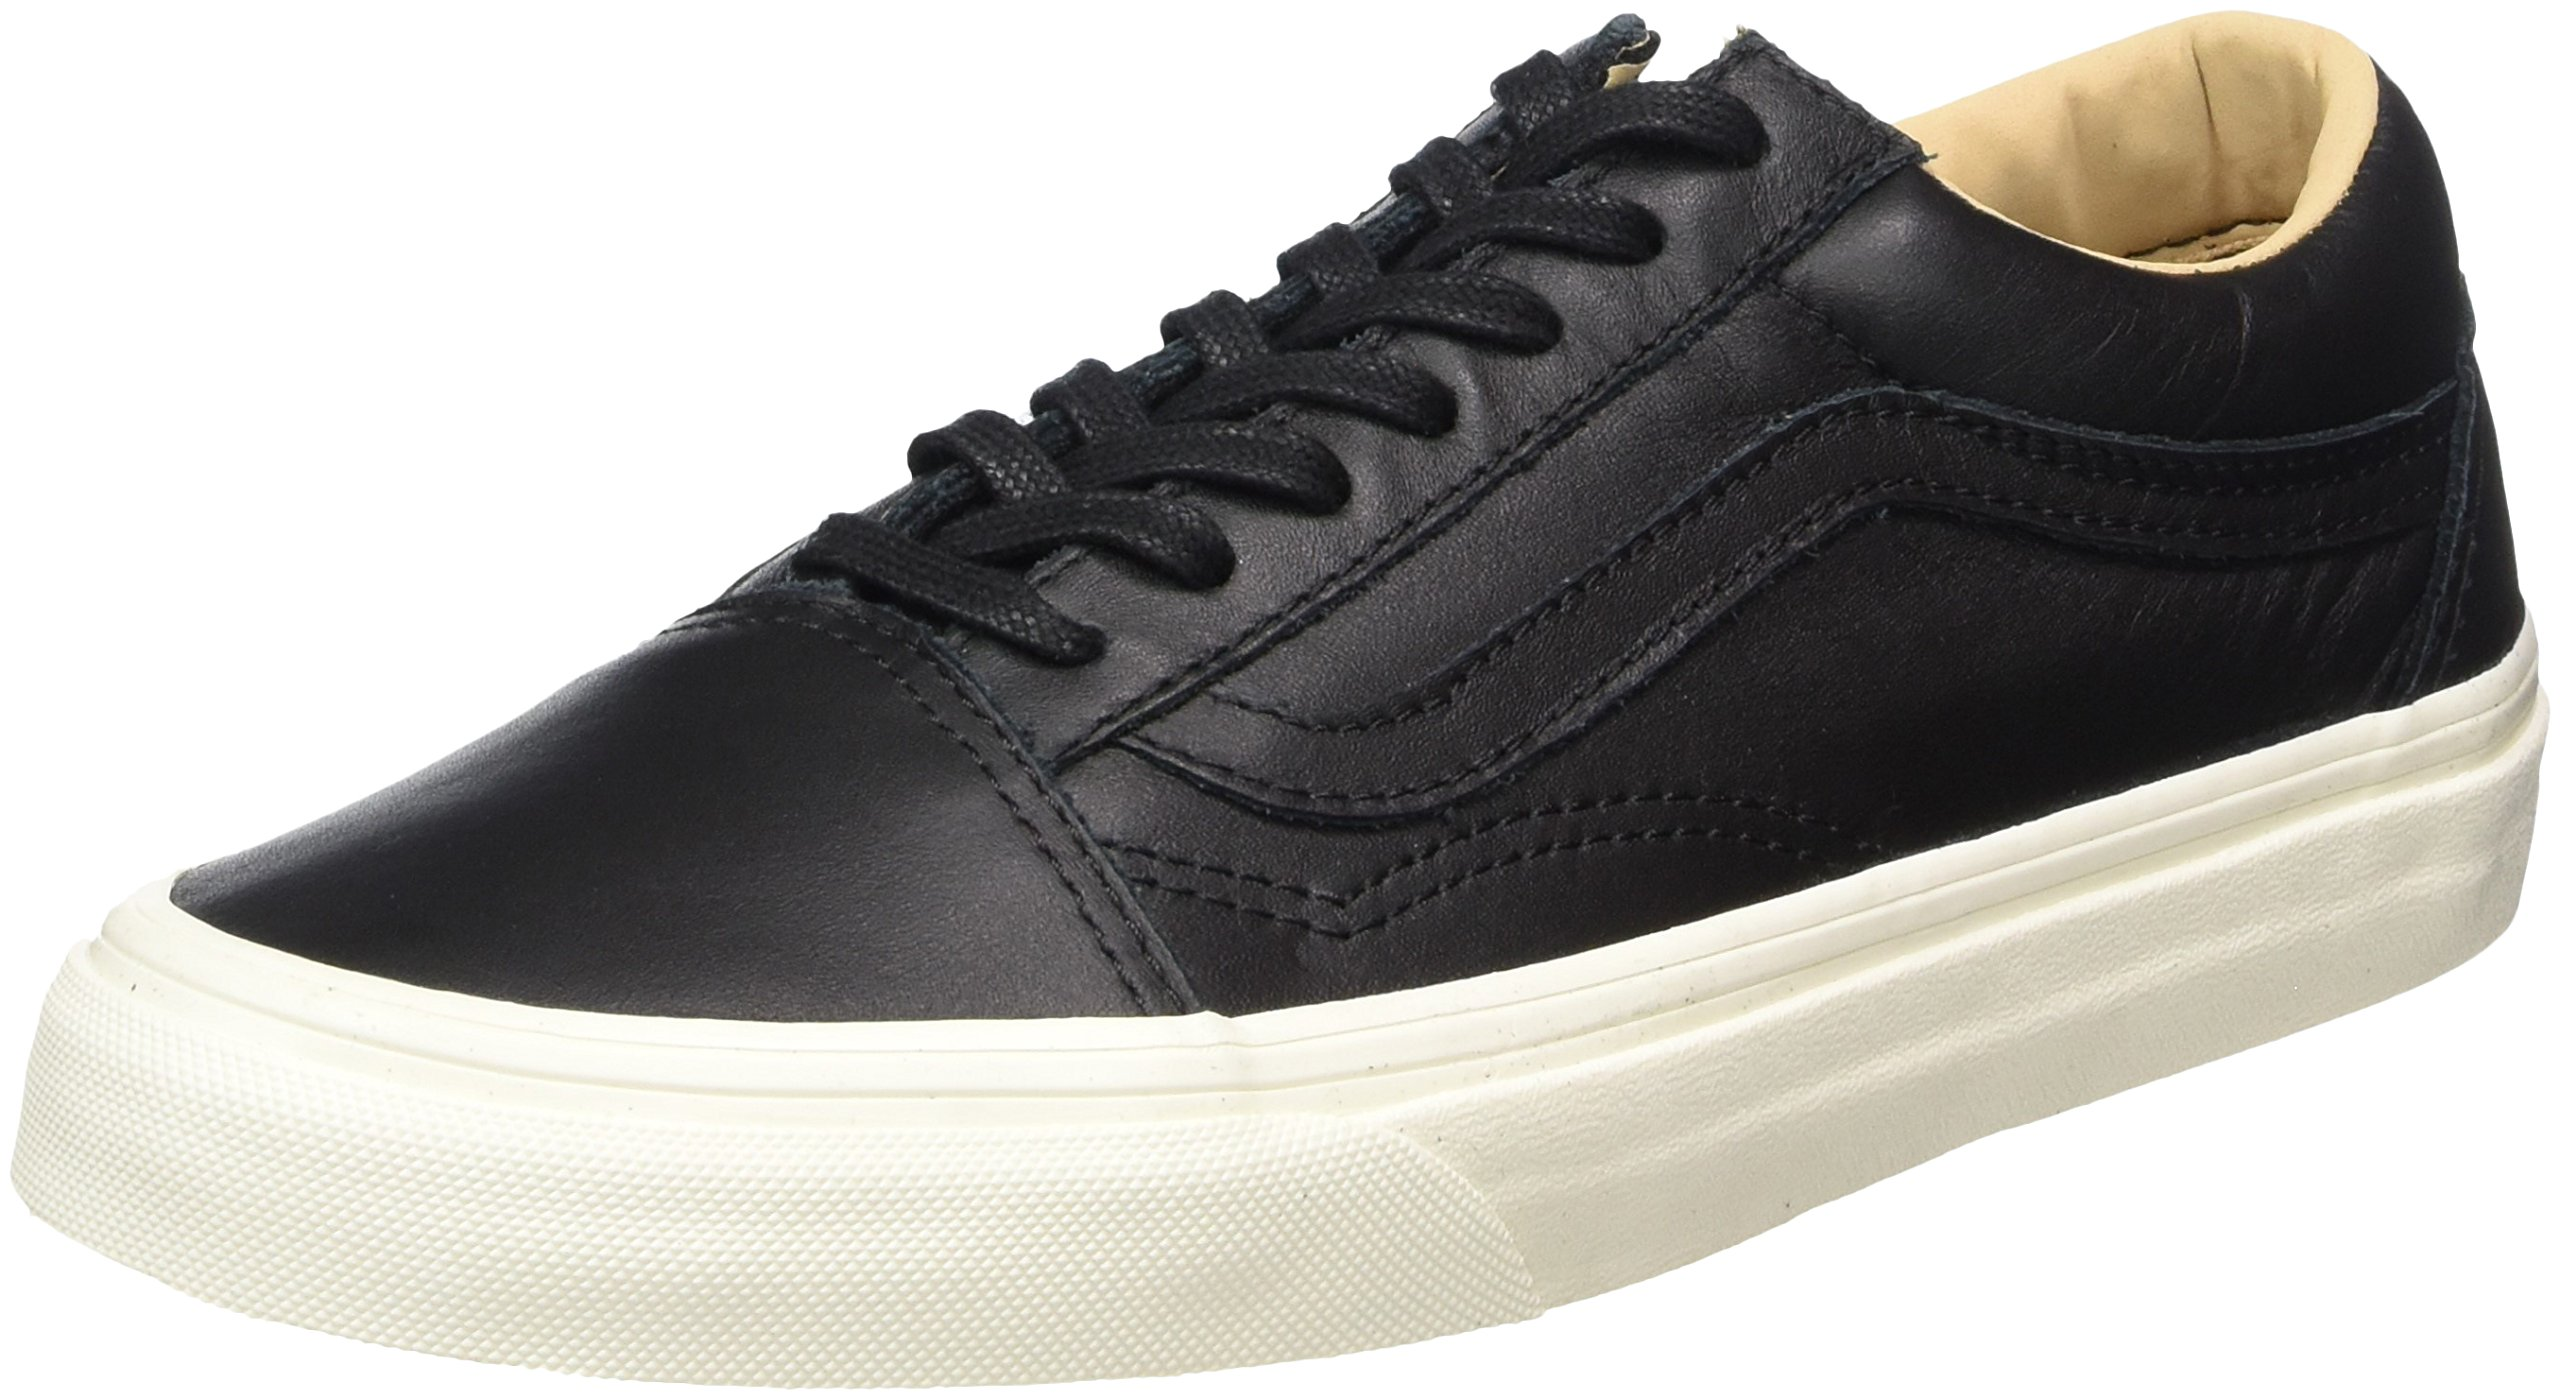 627db05a54b68 Vans Old Skool Leather, Unisex Adults Trainers, Black (Lux  Leather/Black/Porcini), 9.5 (44 EU)